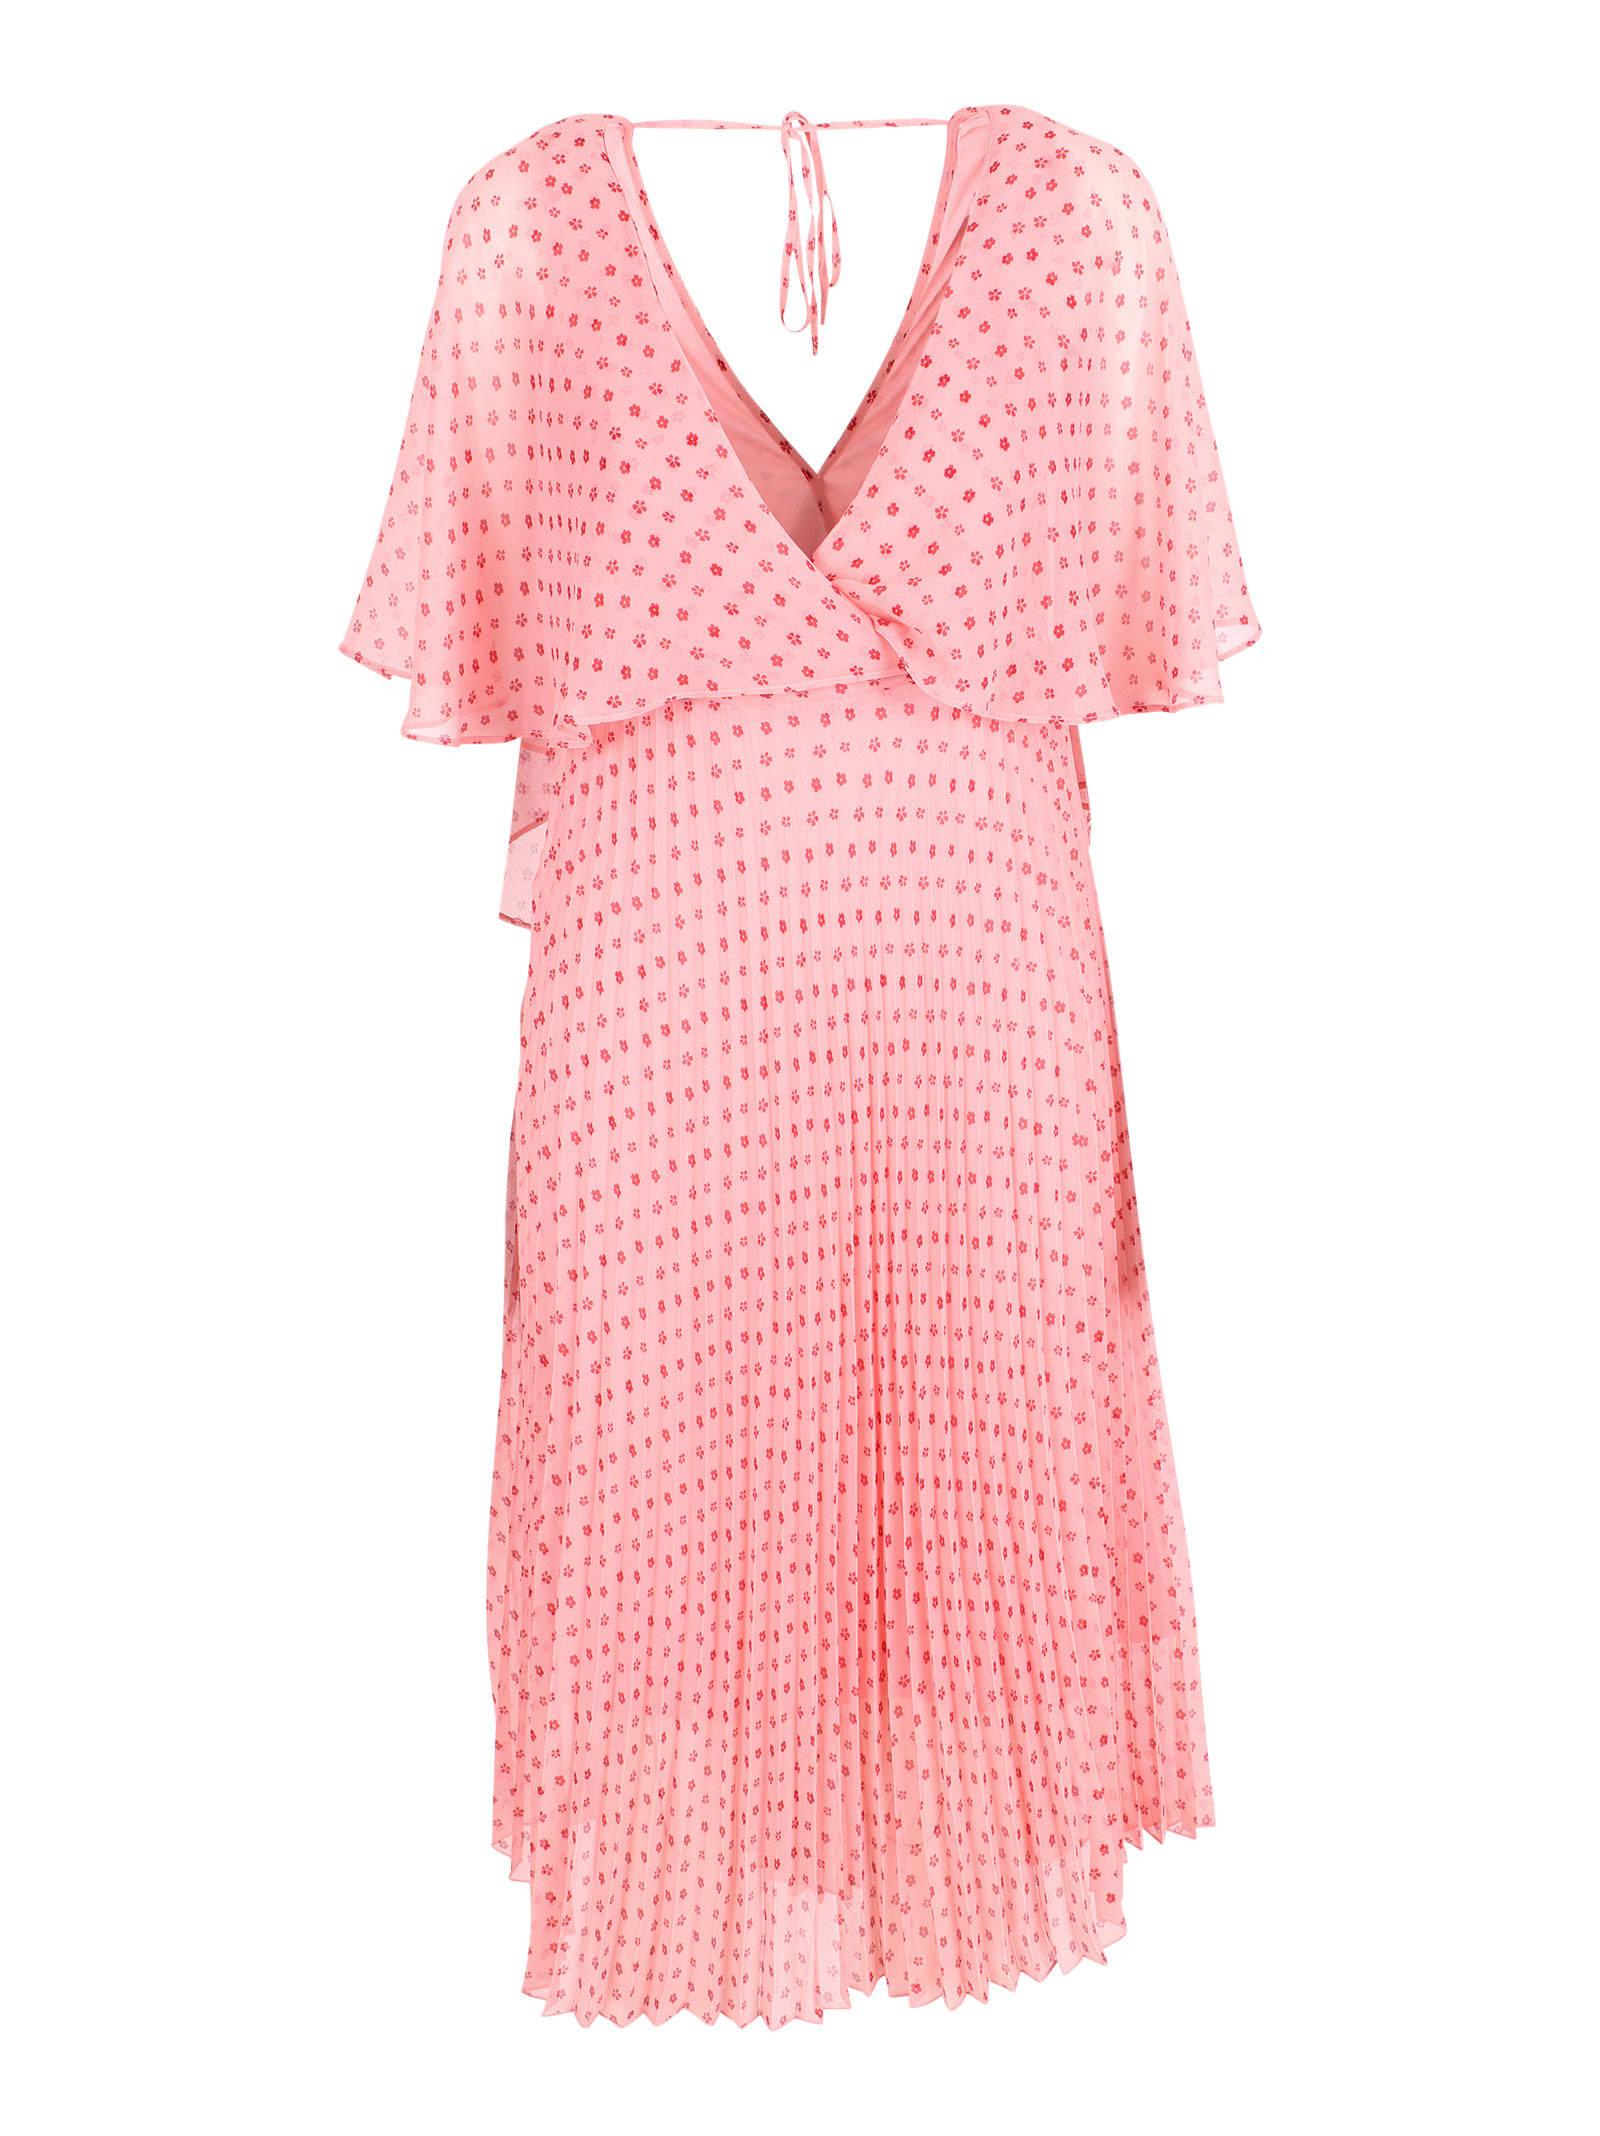 London falun Polyester Dress